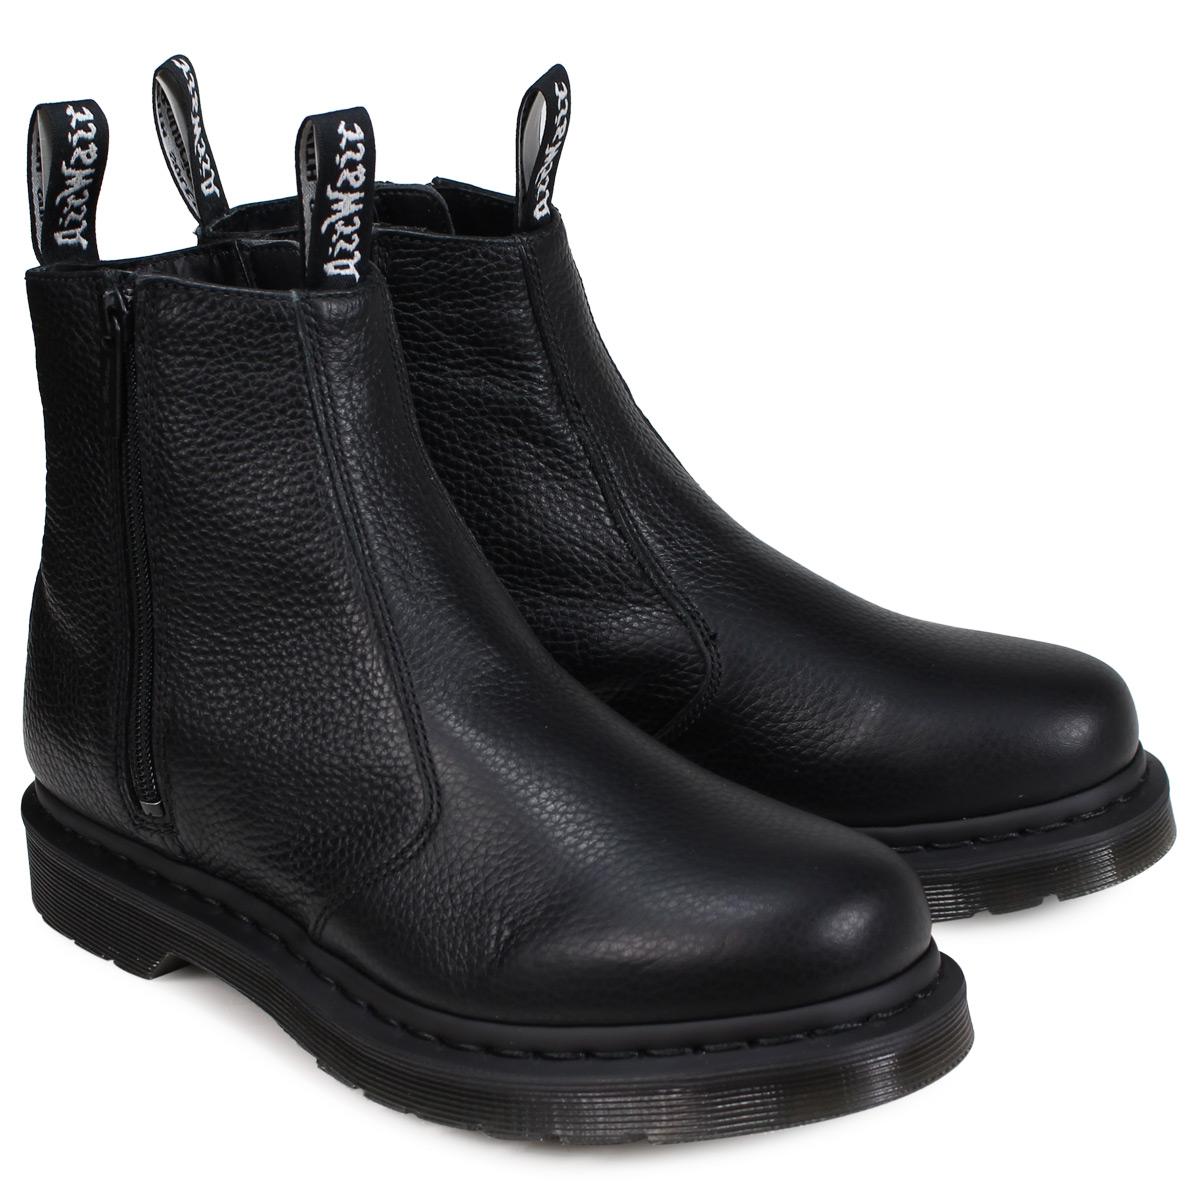 79b8dce5b6 Dr.Martens WOMENS ZIP CHELSEA BOOT doctor Martin 2976 Chelsea boot Lady's  men black R22133001 ...